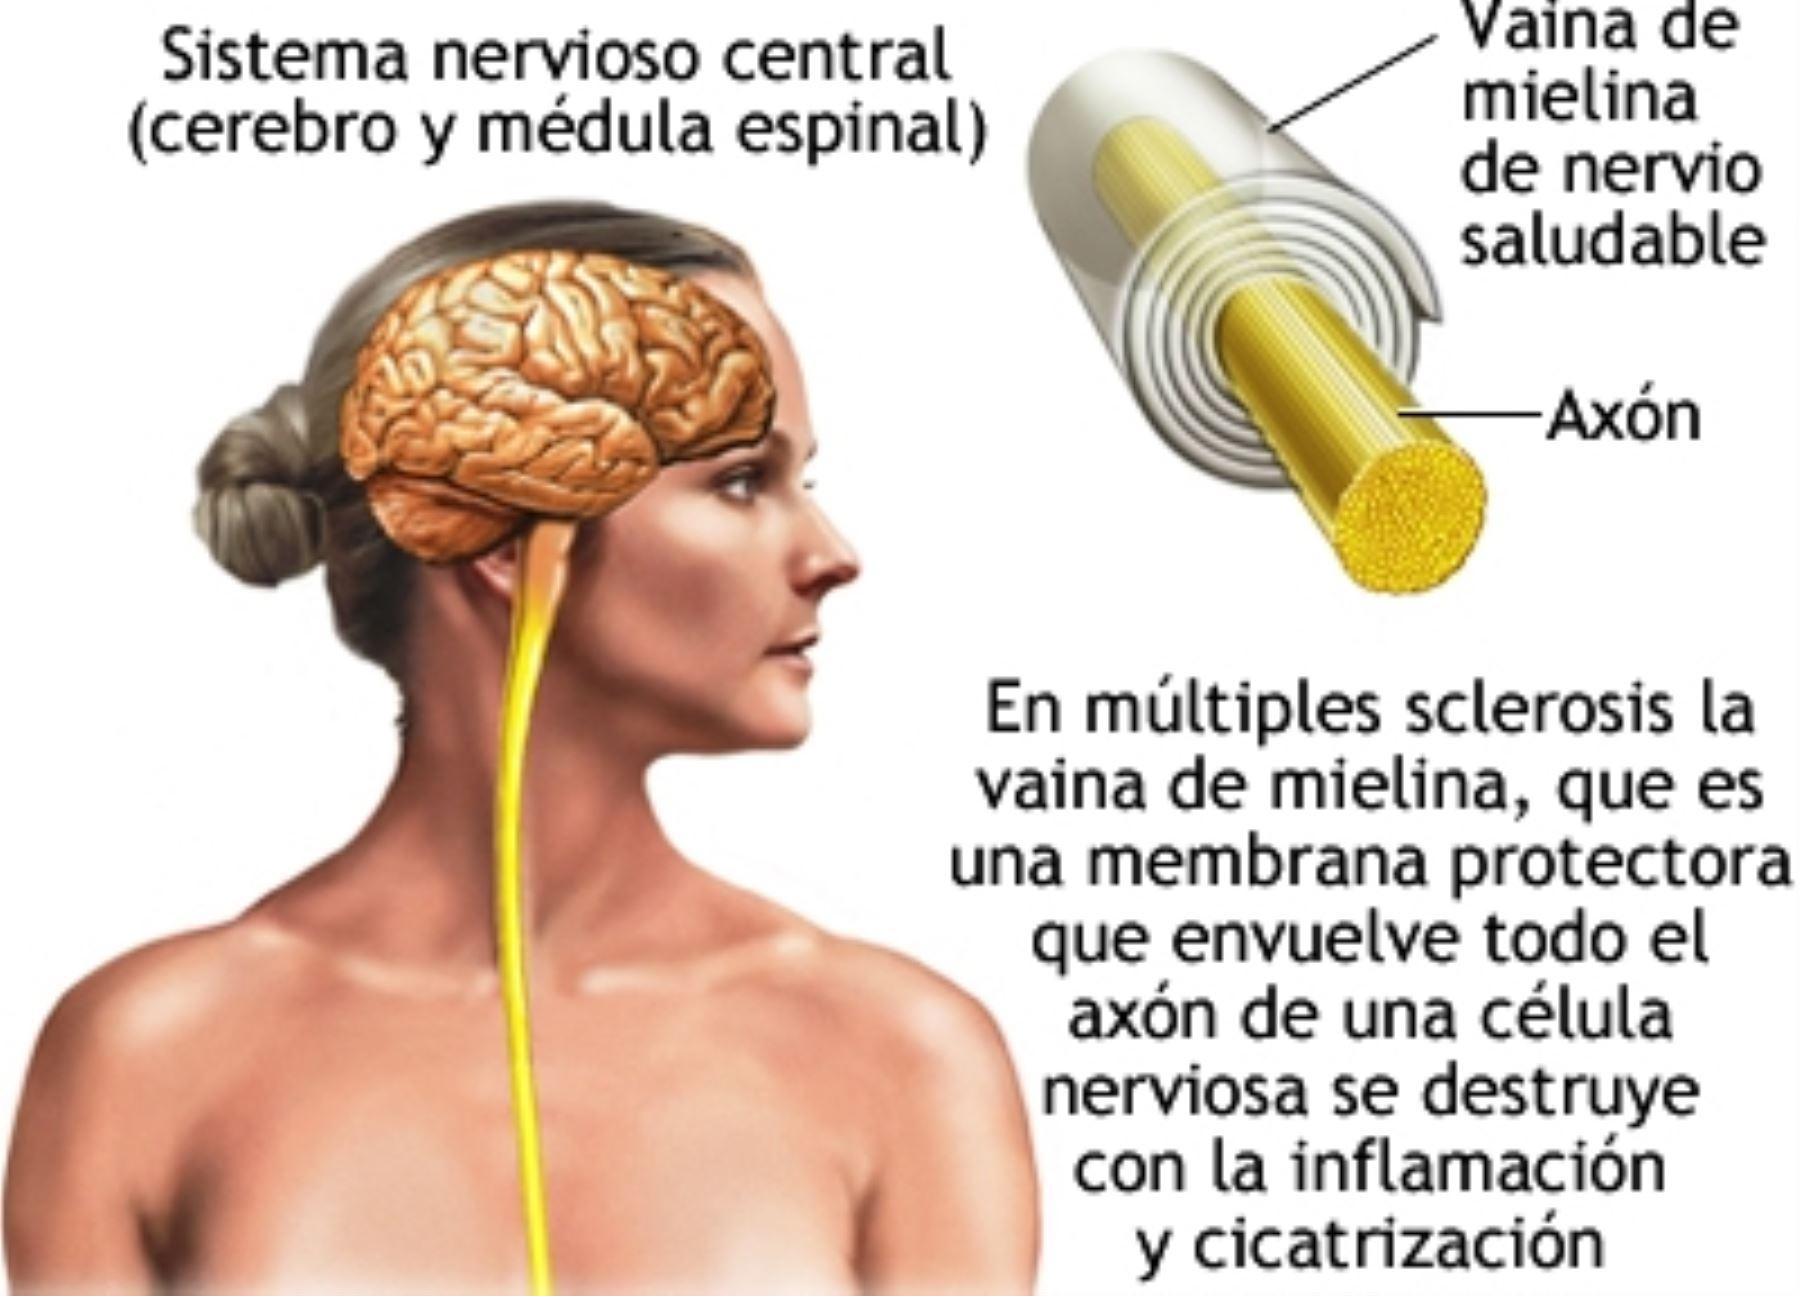 Siete de cada 100 mil peruanos sufren de esclerosis múltiple. Foto: ANDINA/Difusión.